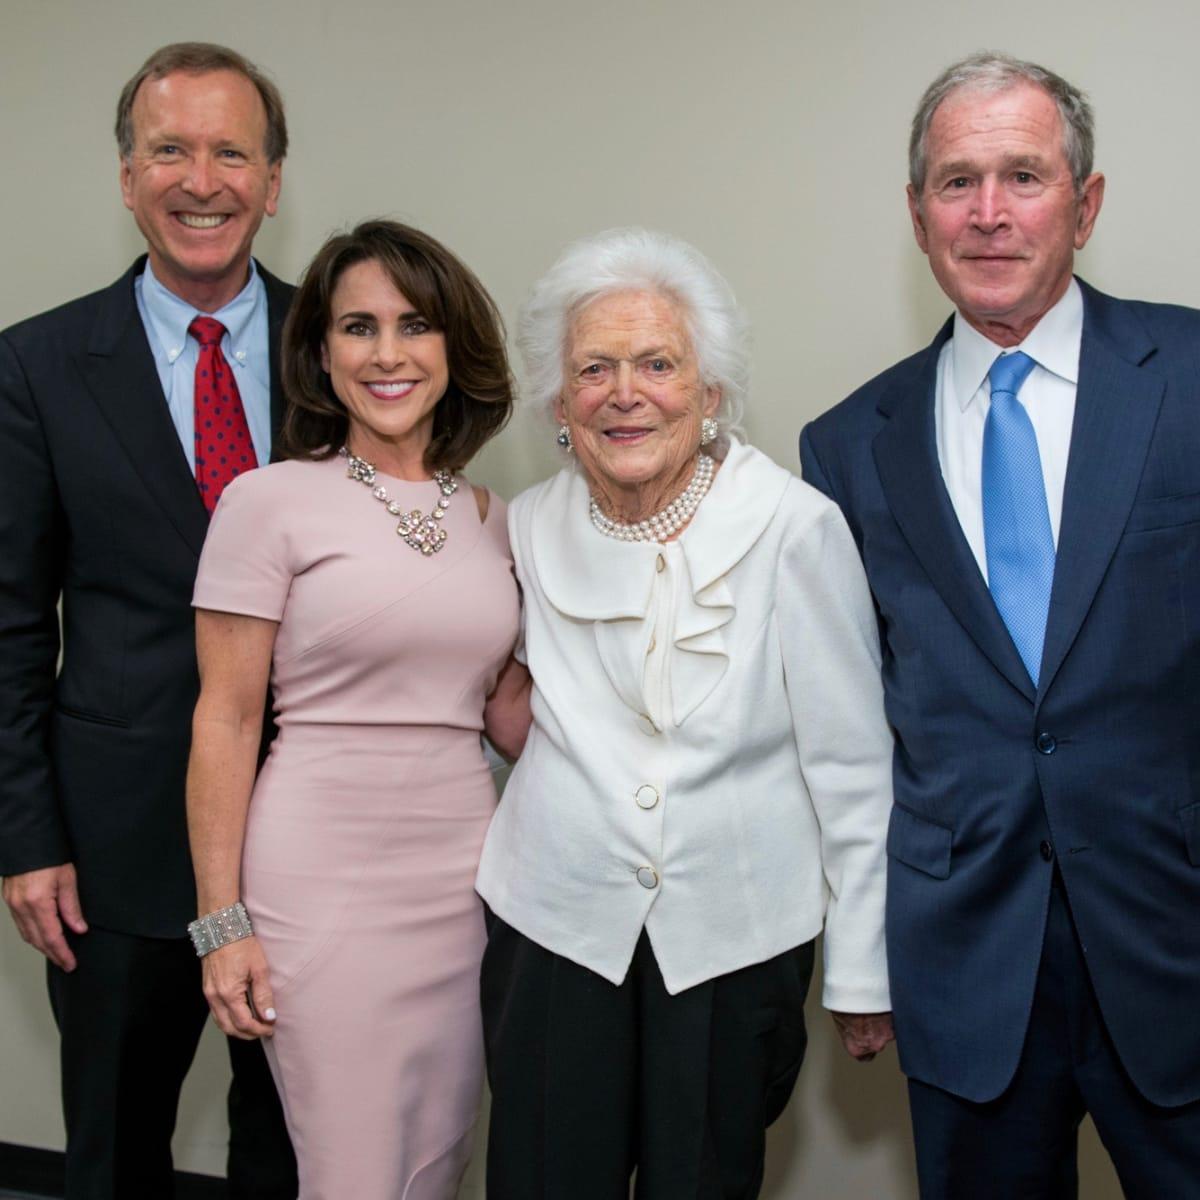 Celebration of Reading 2017: Neil and Maria Bush, Barbara Bush, Former President George W. Bush